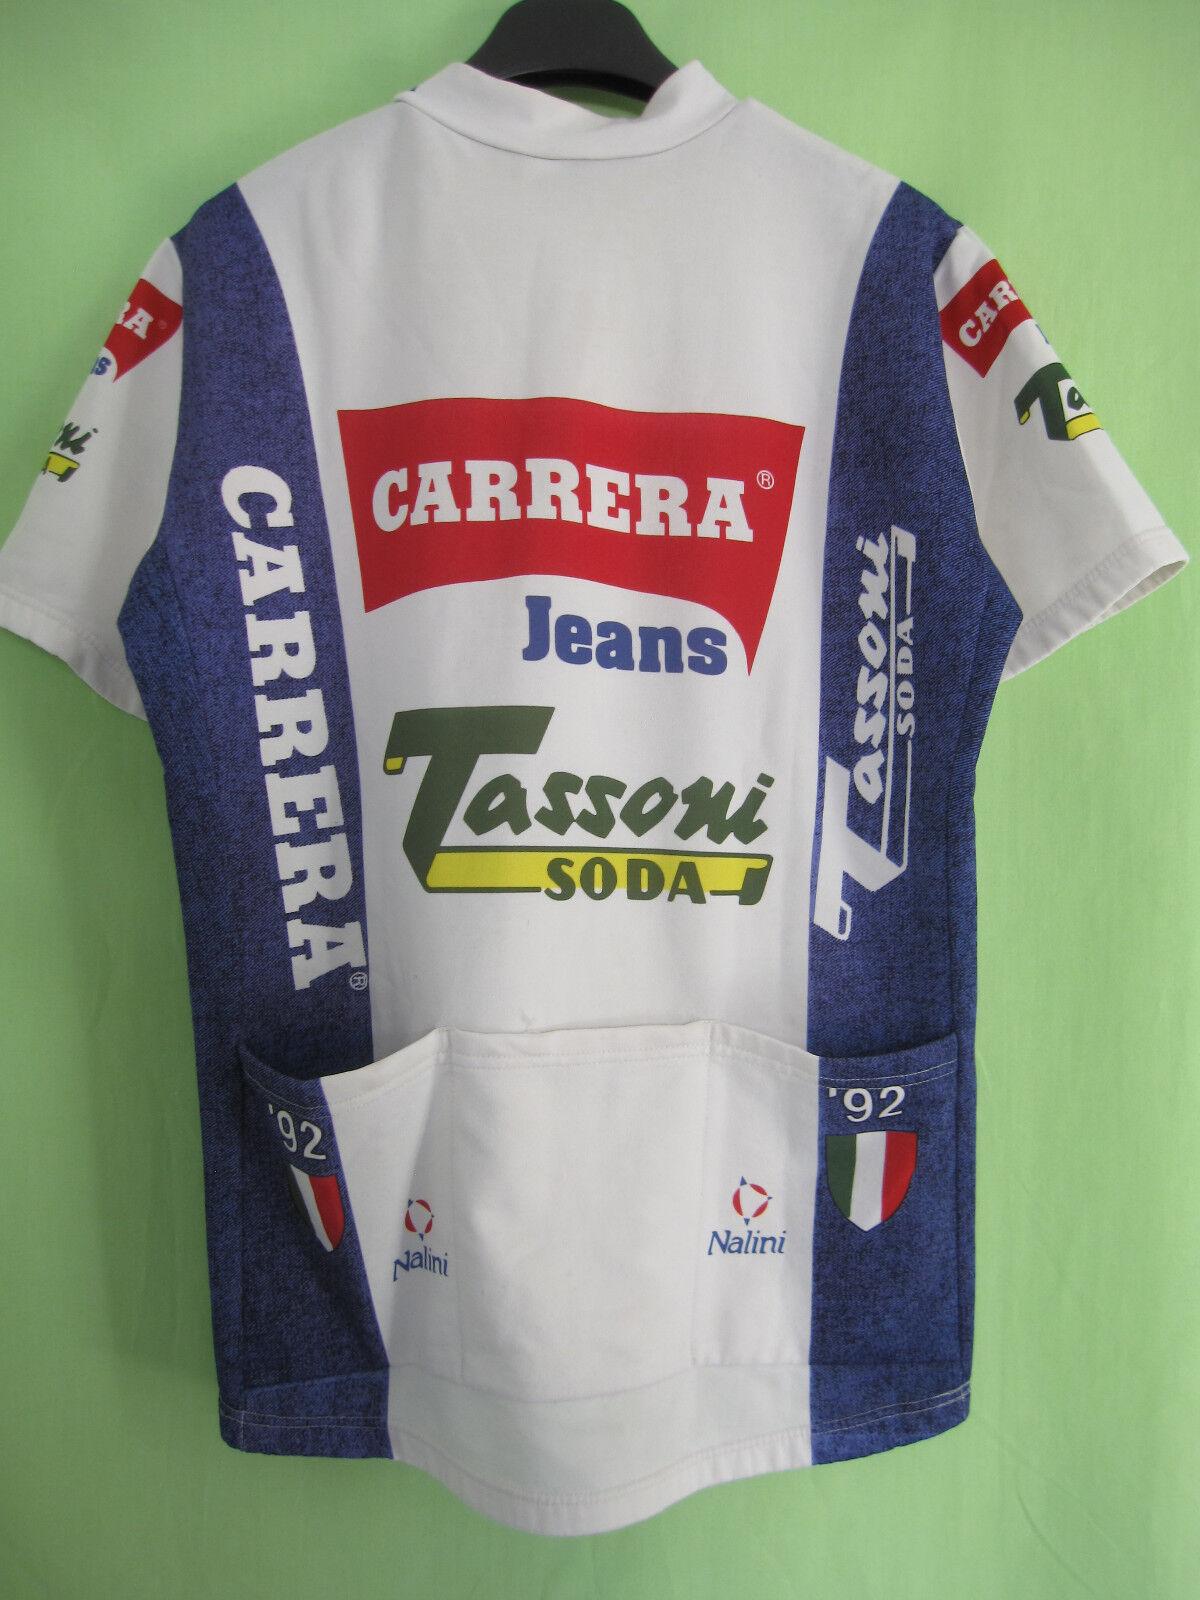 Maillot Cycliste Carrera Tassoni Soda tour 1992 1992 1992 Nalini Jersey cycling - L 6c2d21